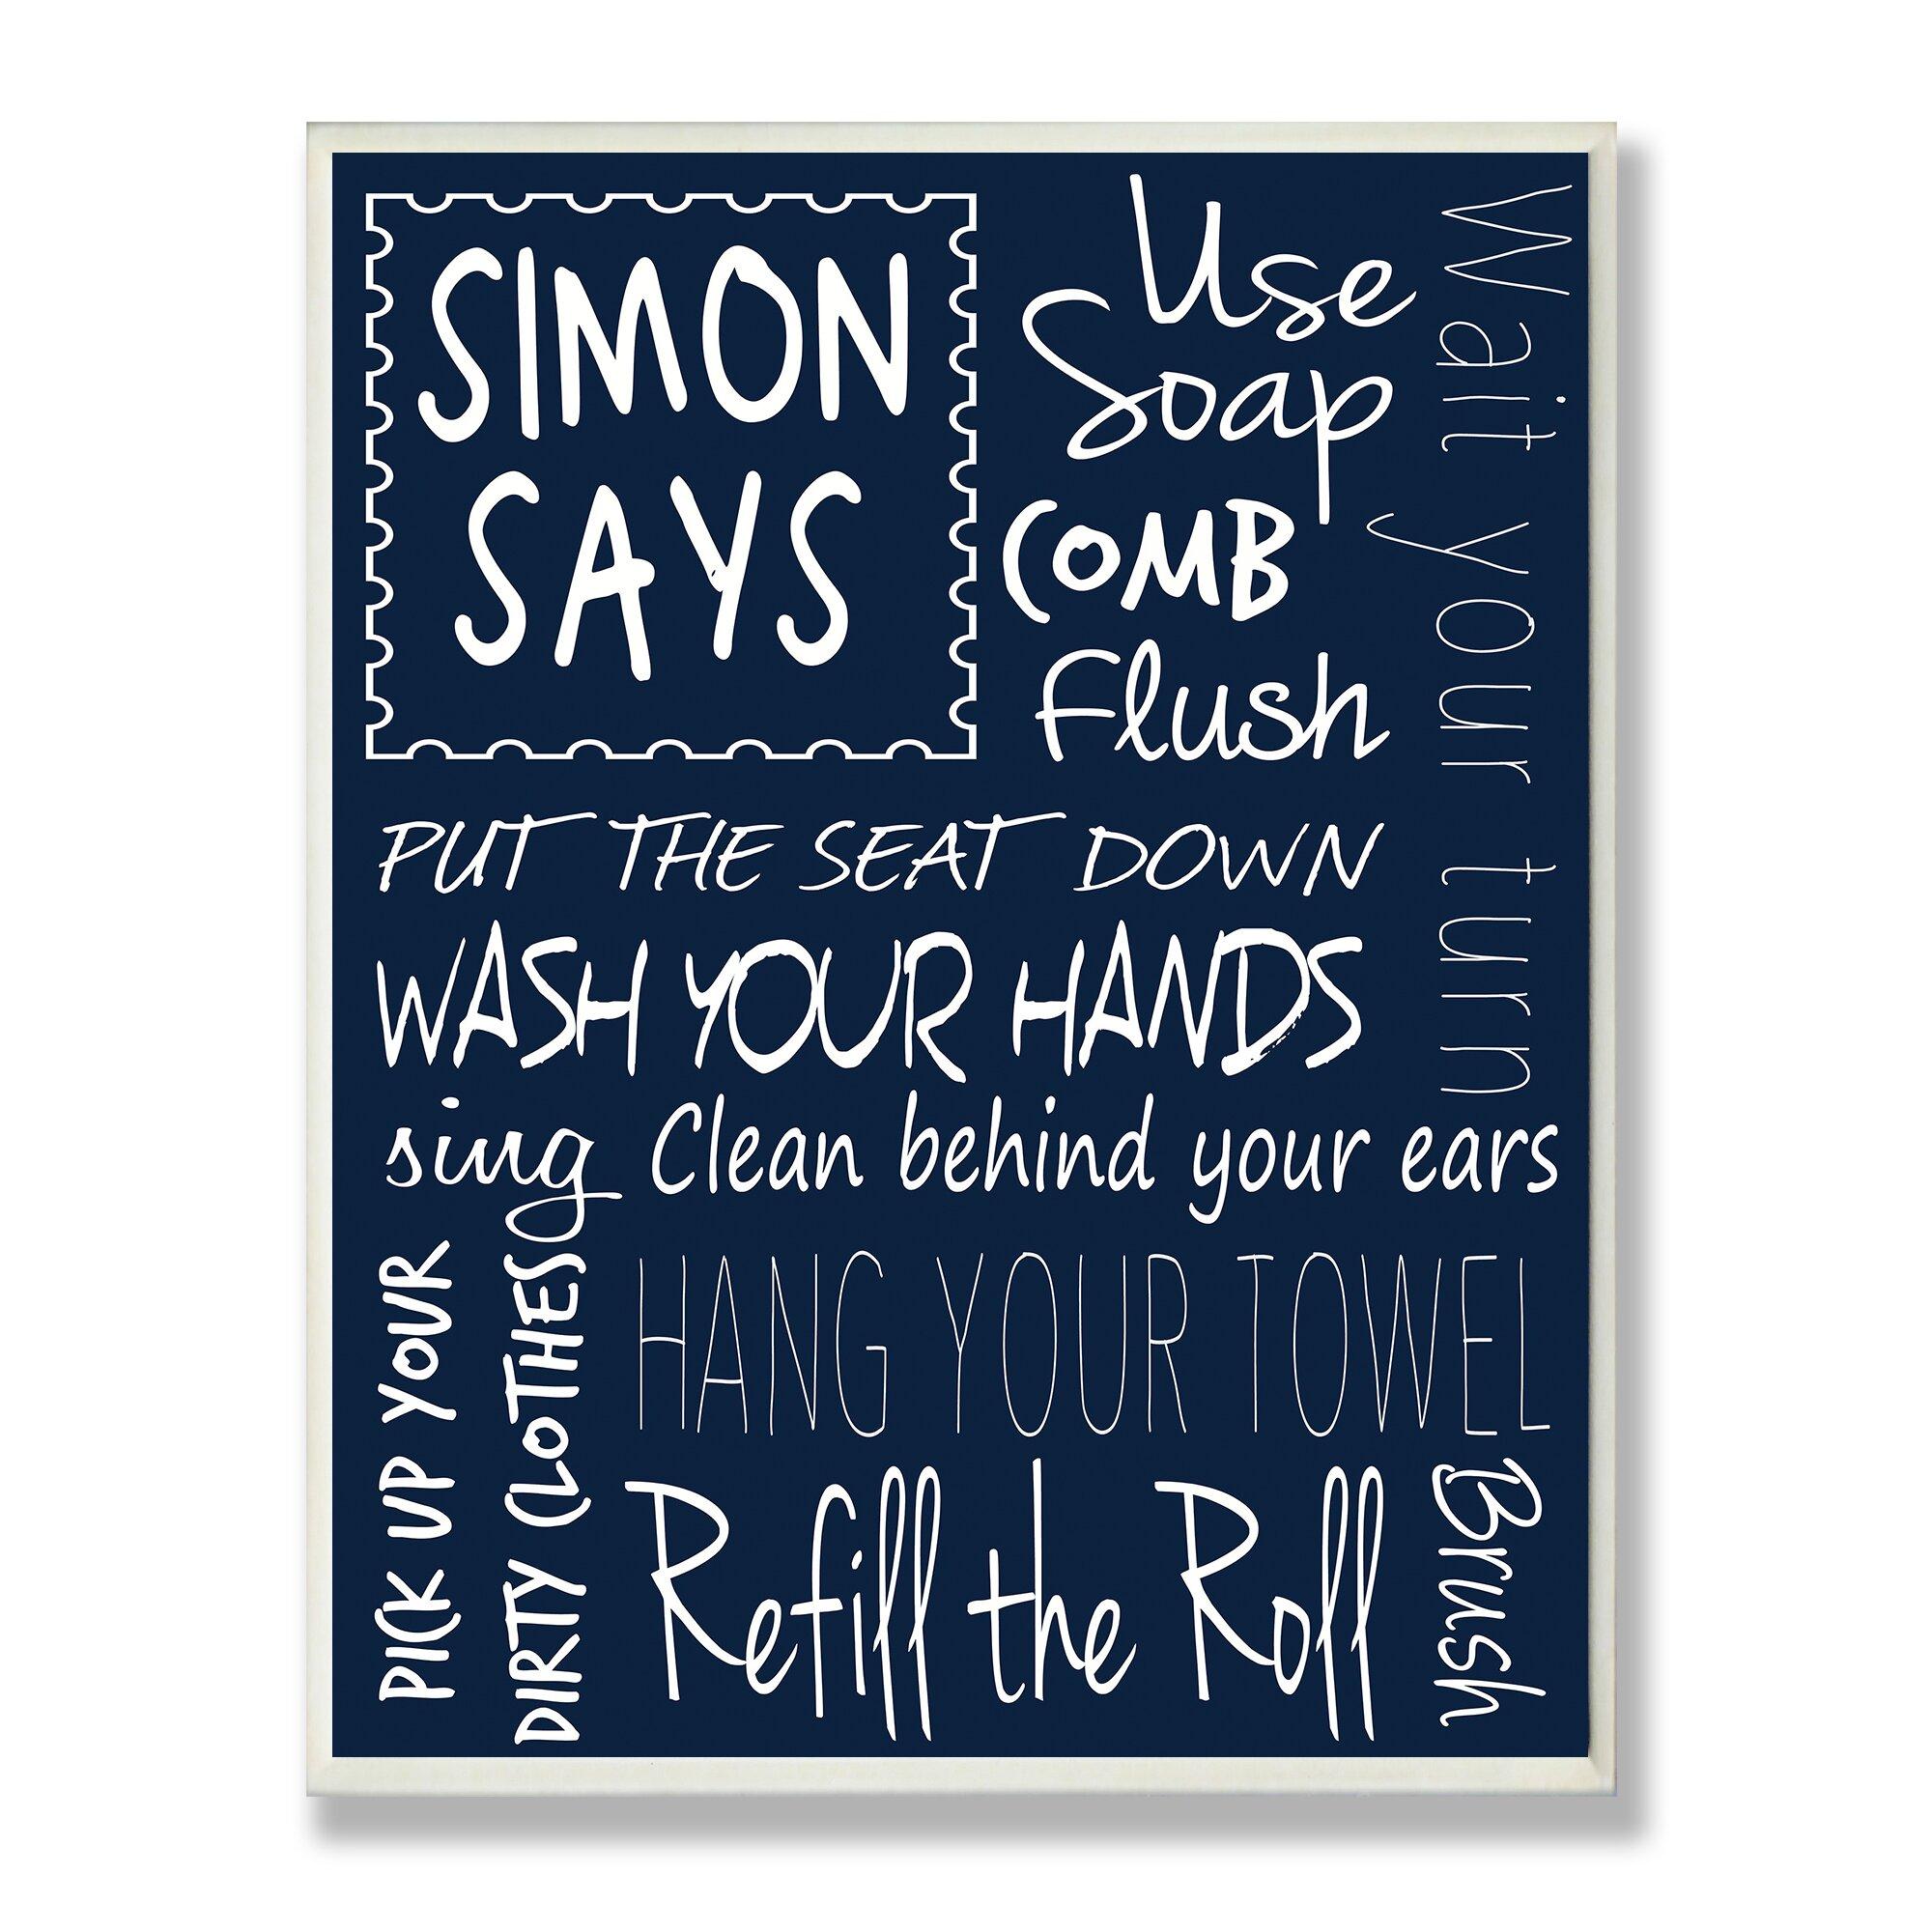 Simon Says Bathroom Rules Textual Art Wall Plaque